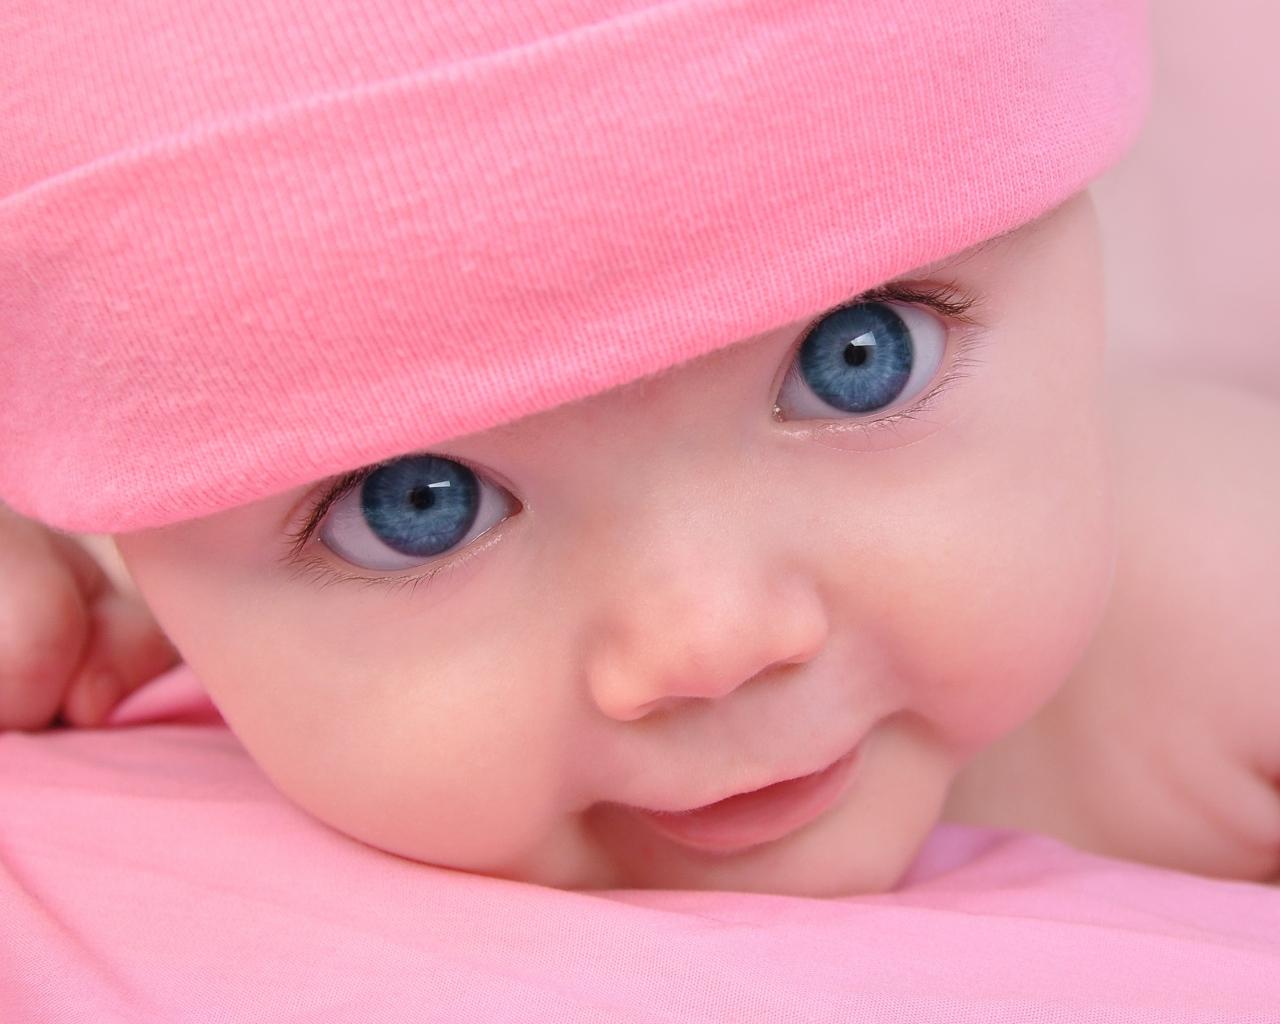 baby_blue_eyes_face_cute_hat_54651_1280x1024